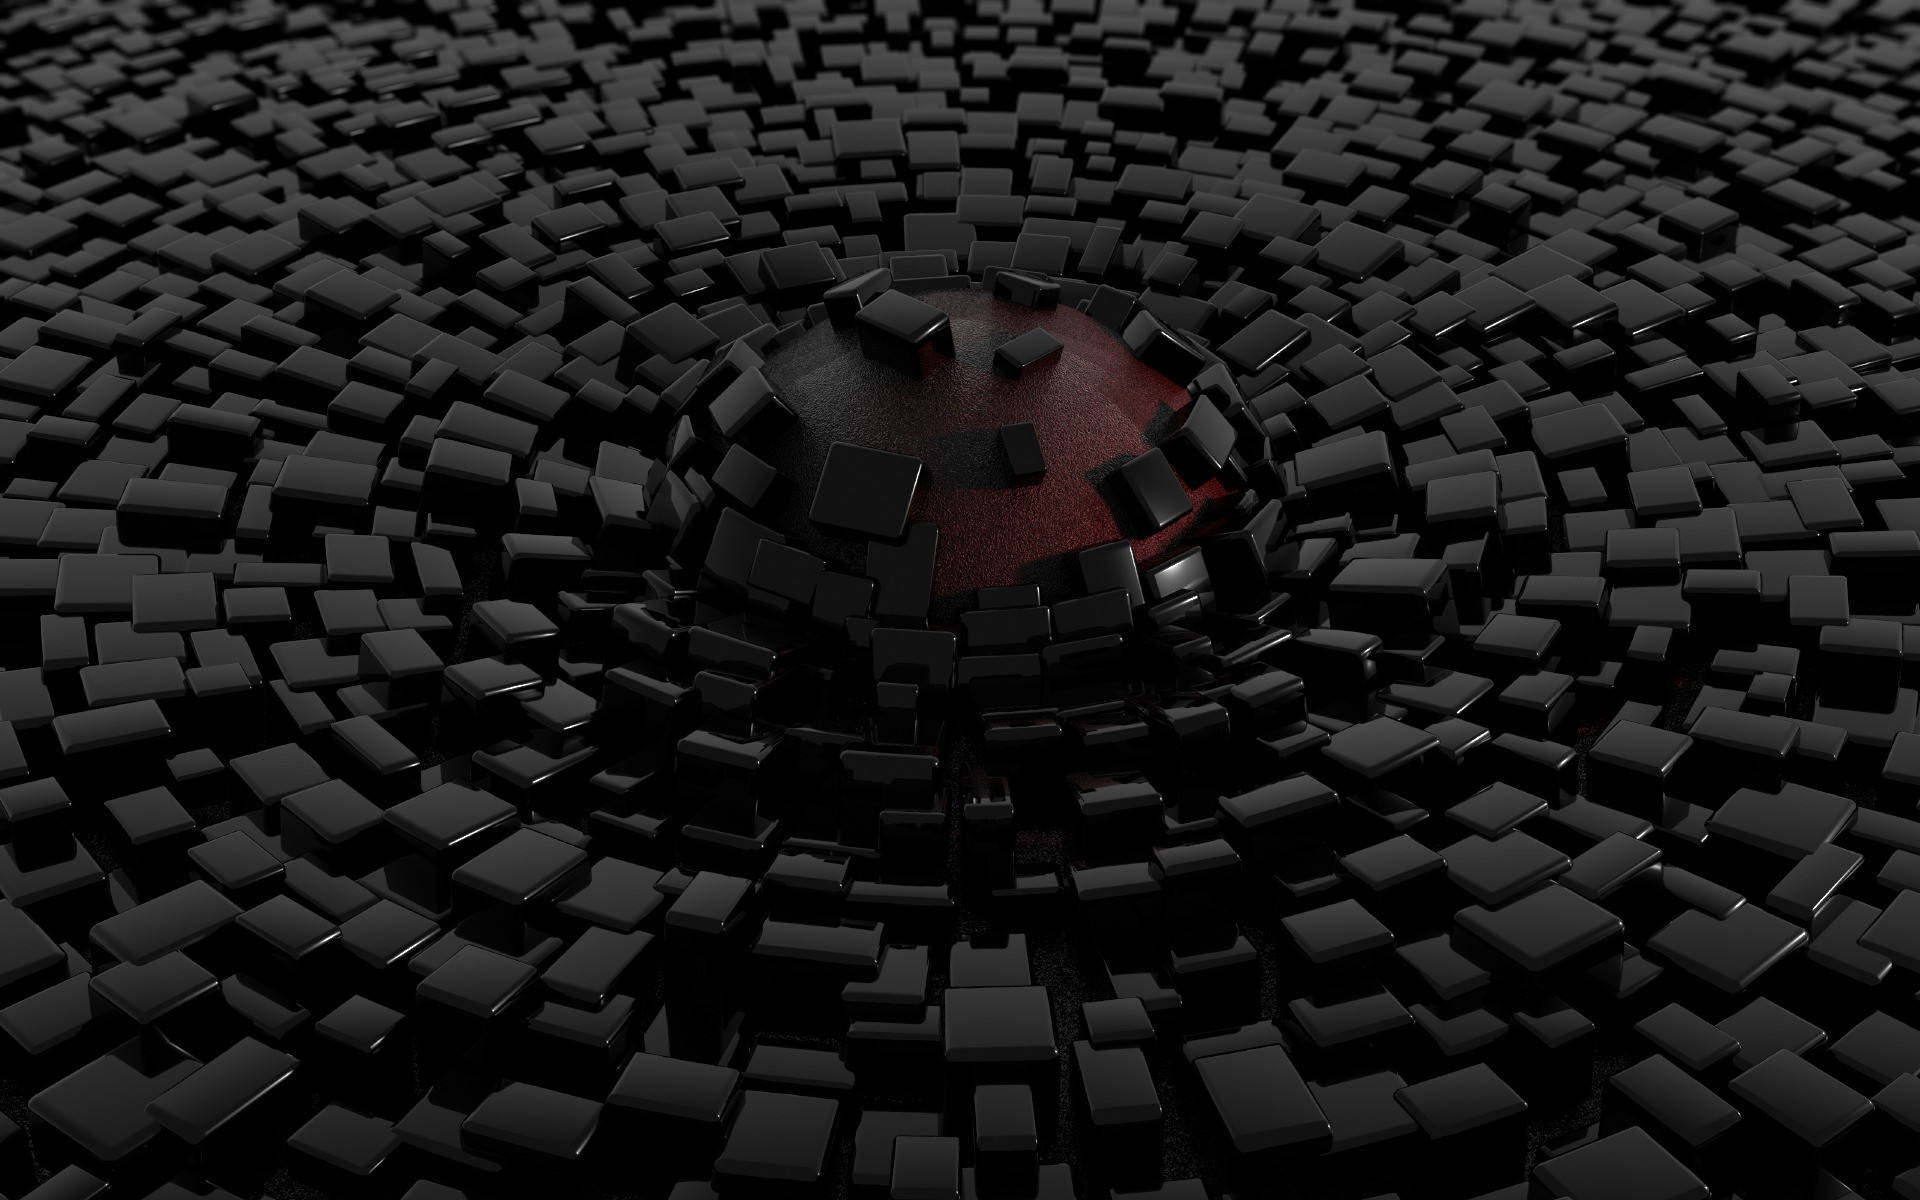 Black 3d Wallpaper Full HD for Desktop Background px 462.52 KB